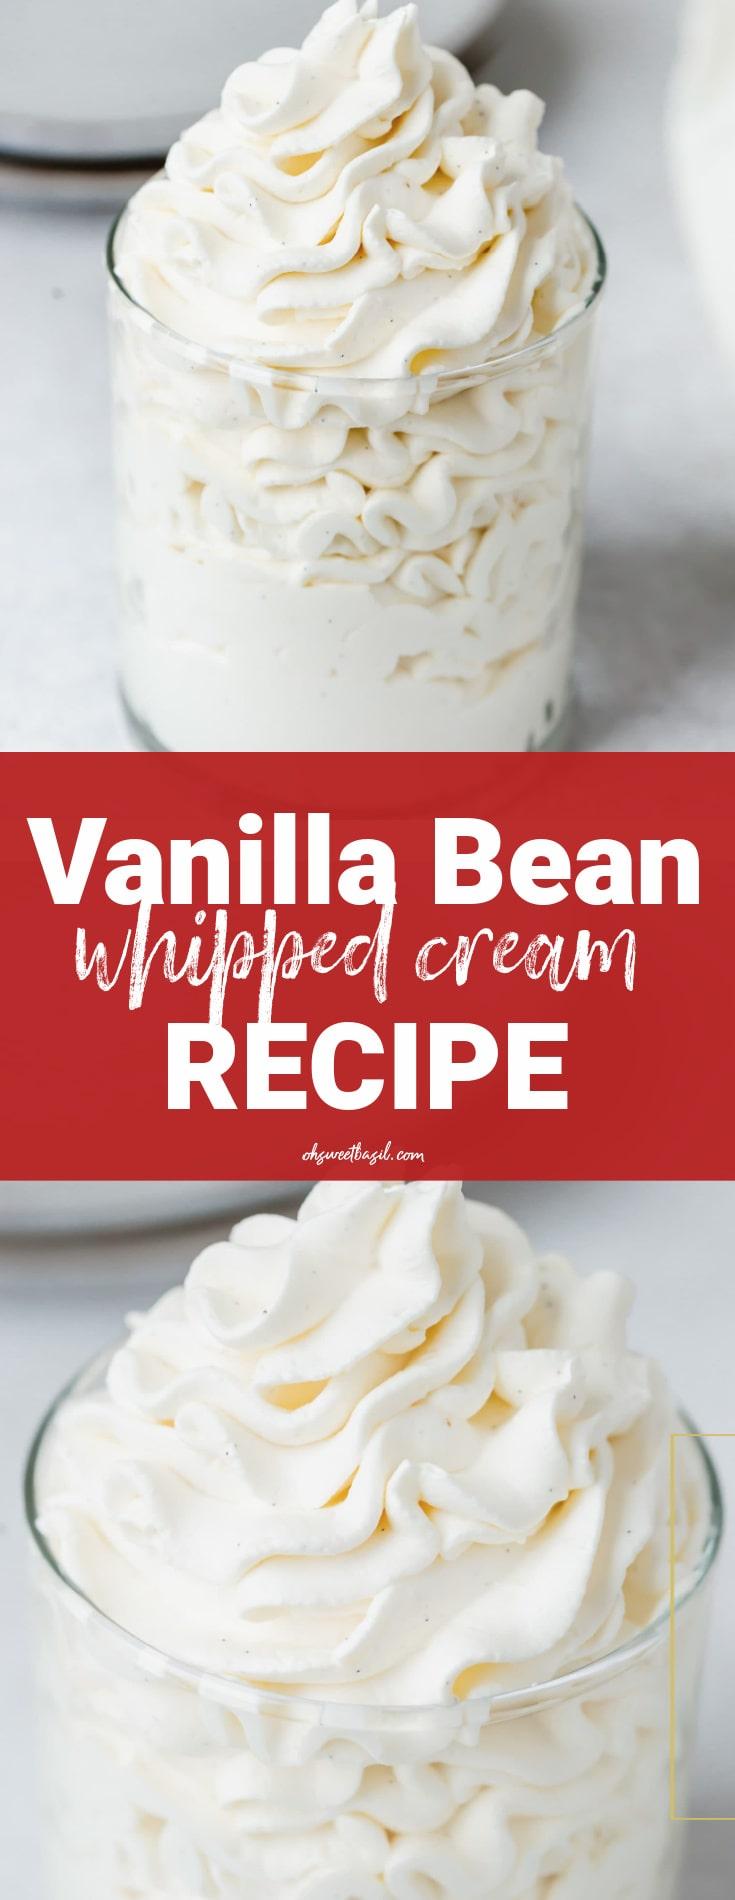 A glass container of mascarpone vanilla bean whipped cream..